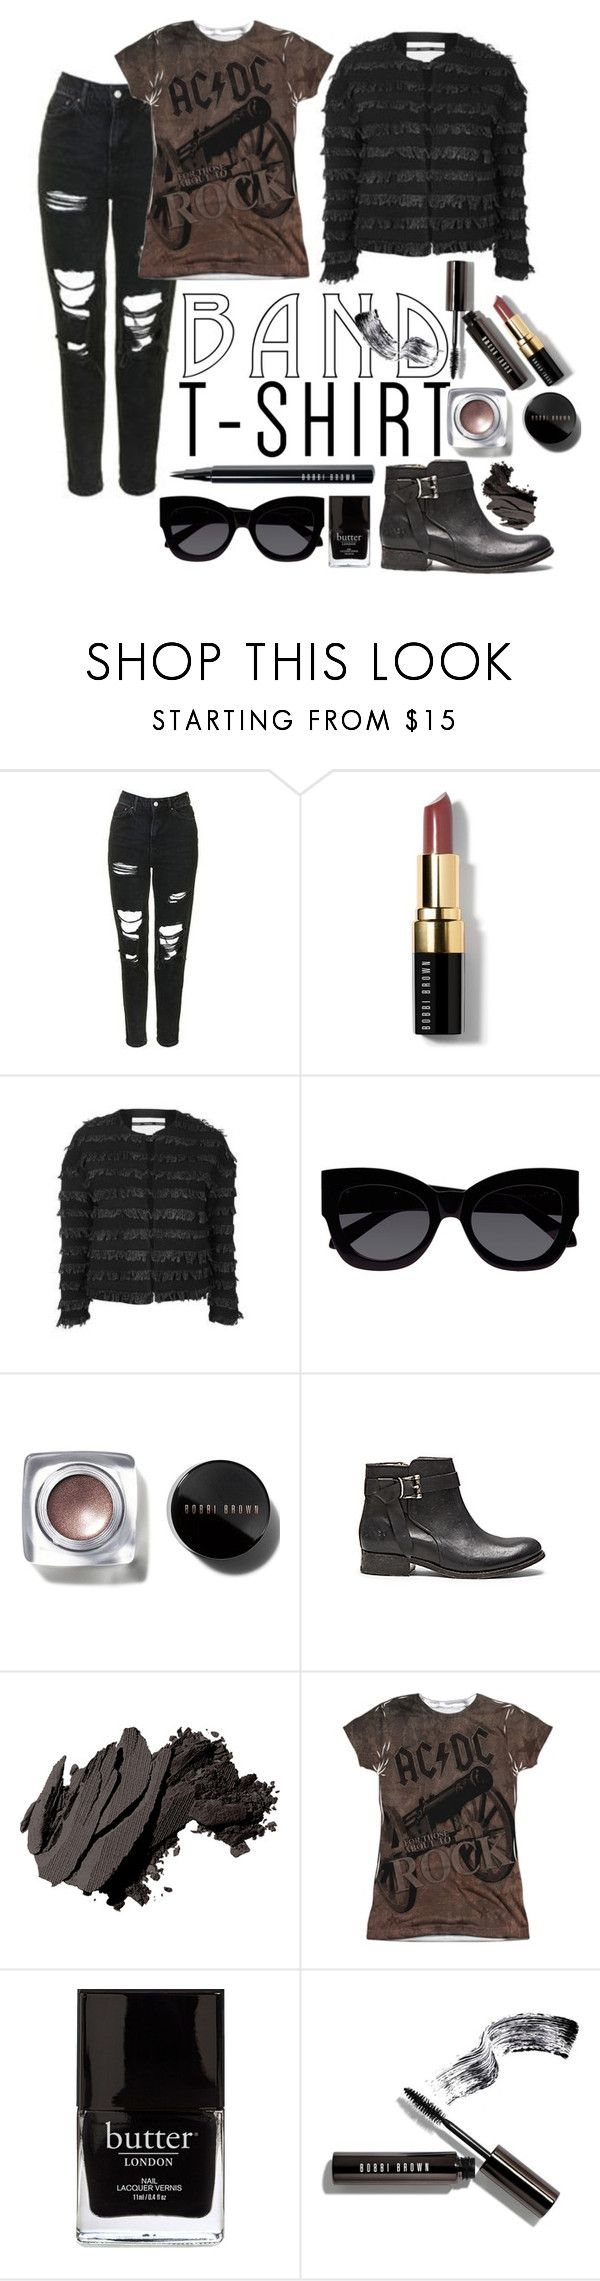 """2016 band shirt"" by vaughnroyal ❤ liked on Polyvore featuring Bobbi Brown Cosmetics, Topshop, Karen Walker and Jack Black"